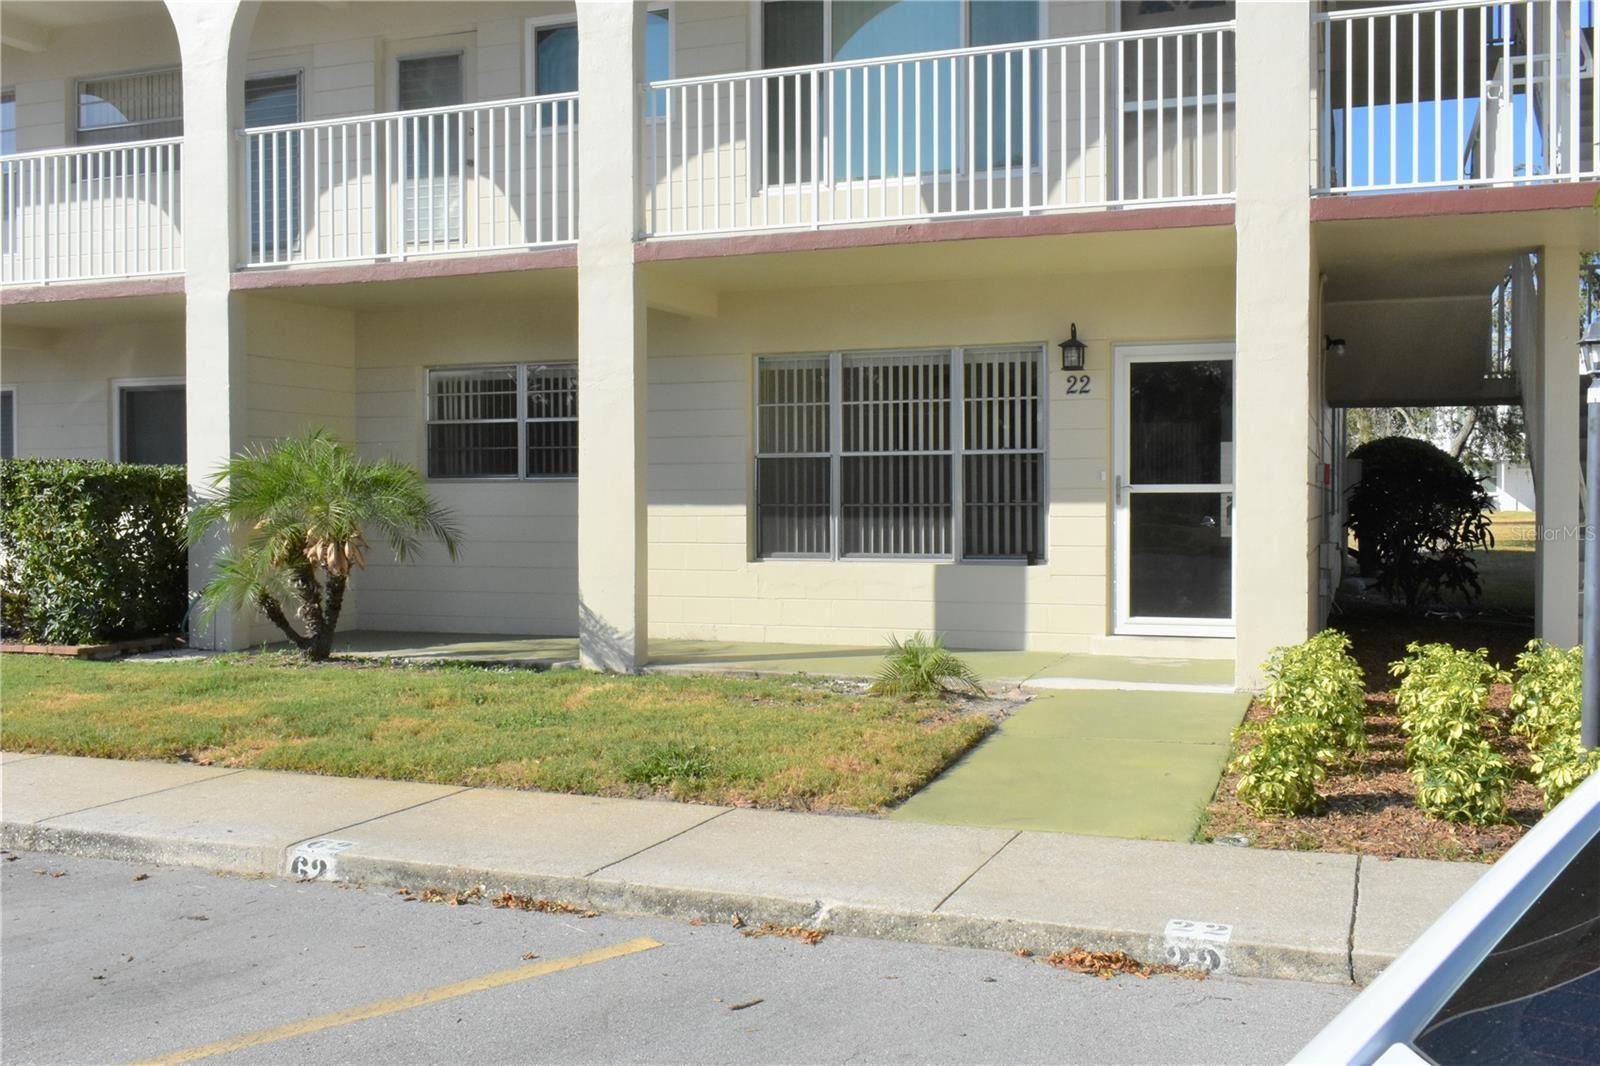 2434 AUSTRALIA WAY E #22, Clearwater, FL 33763 - MLS#: U8124609